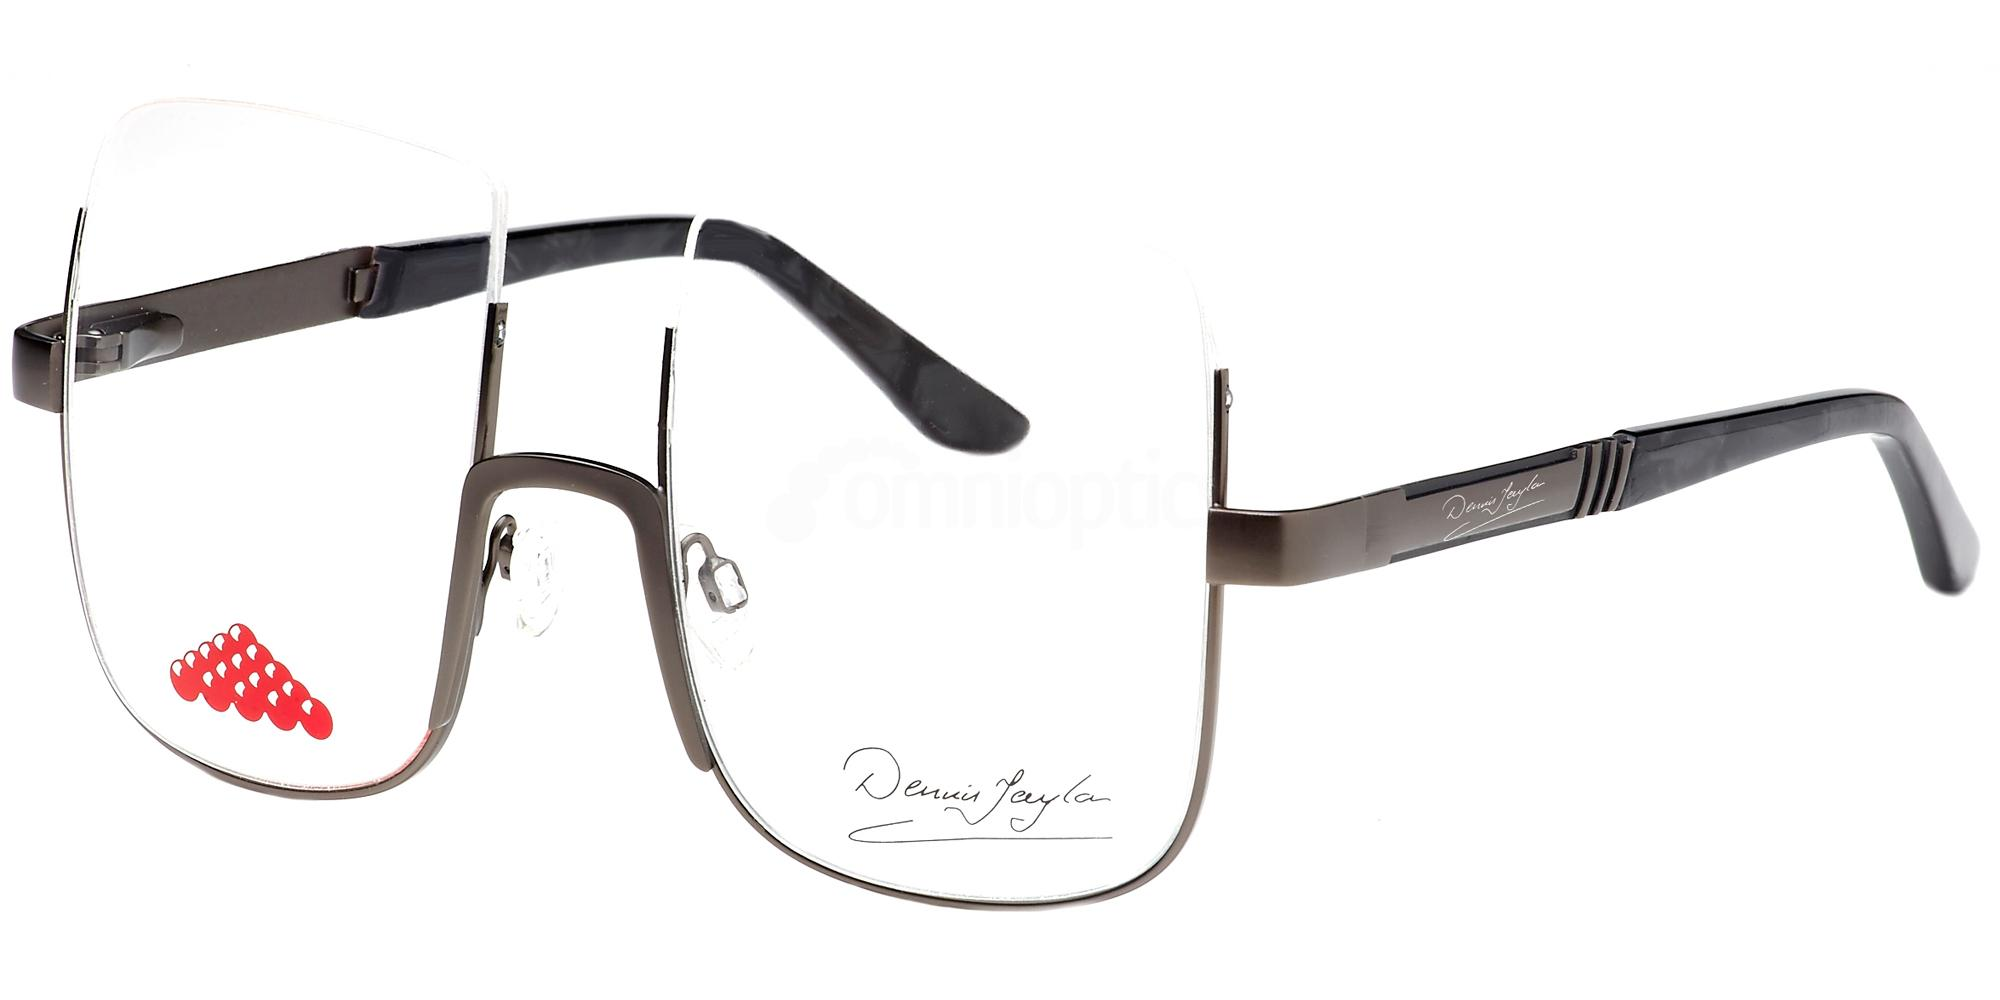 C1 DTSN02 - Pro-Snooker Glasses , Dennis Taylor